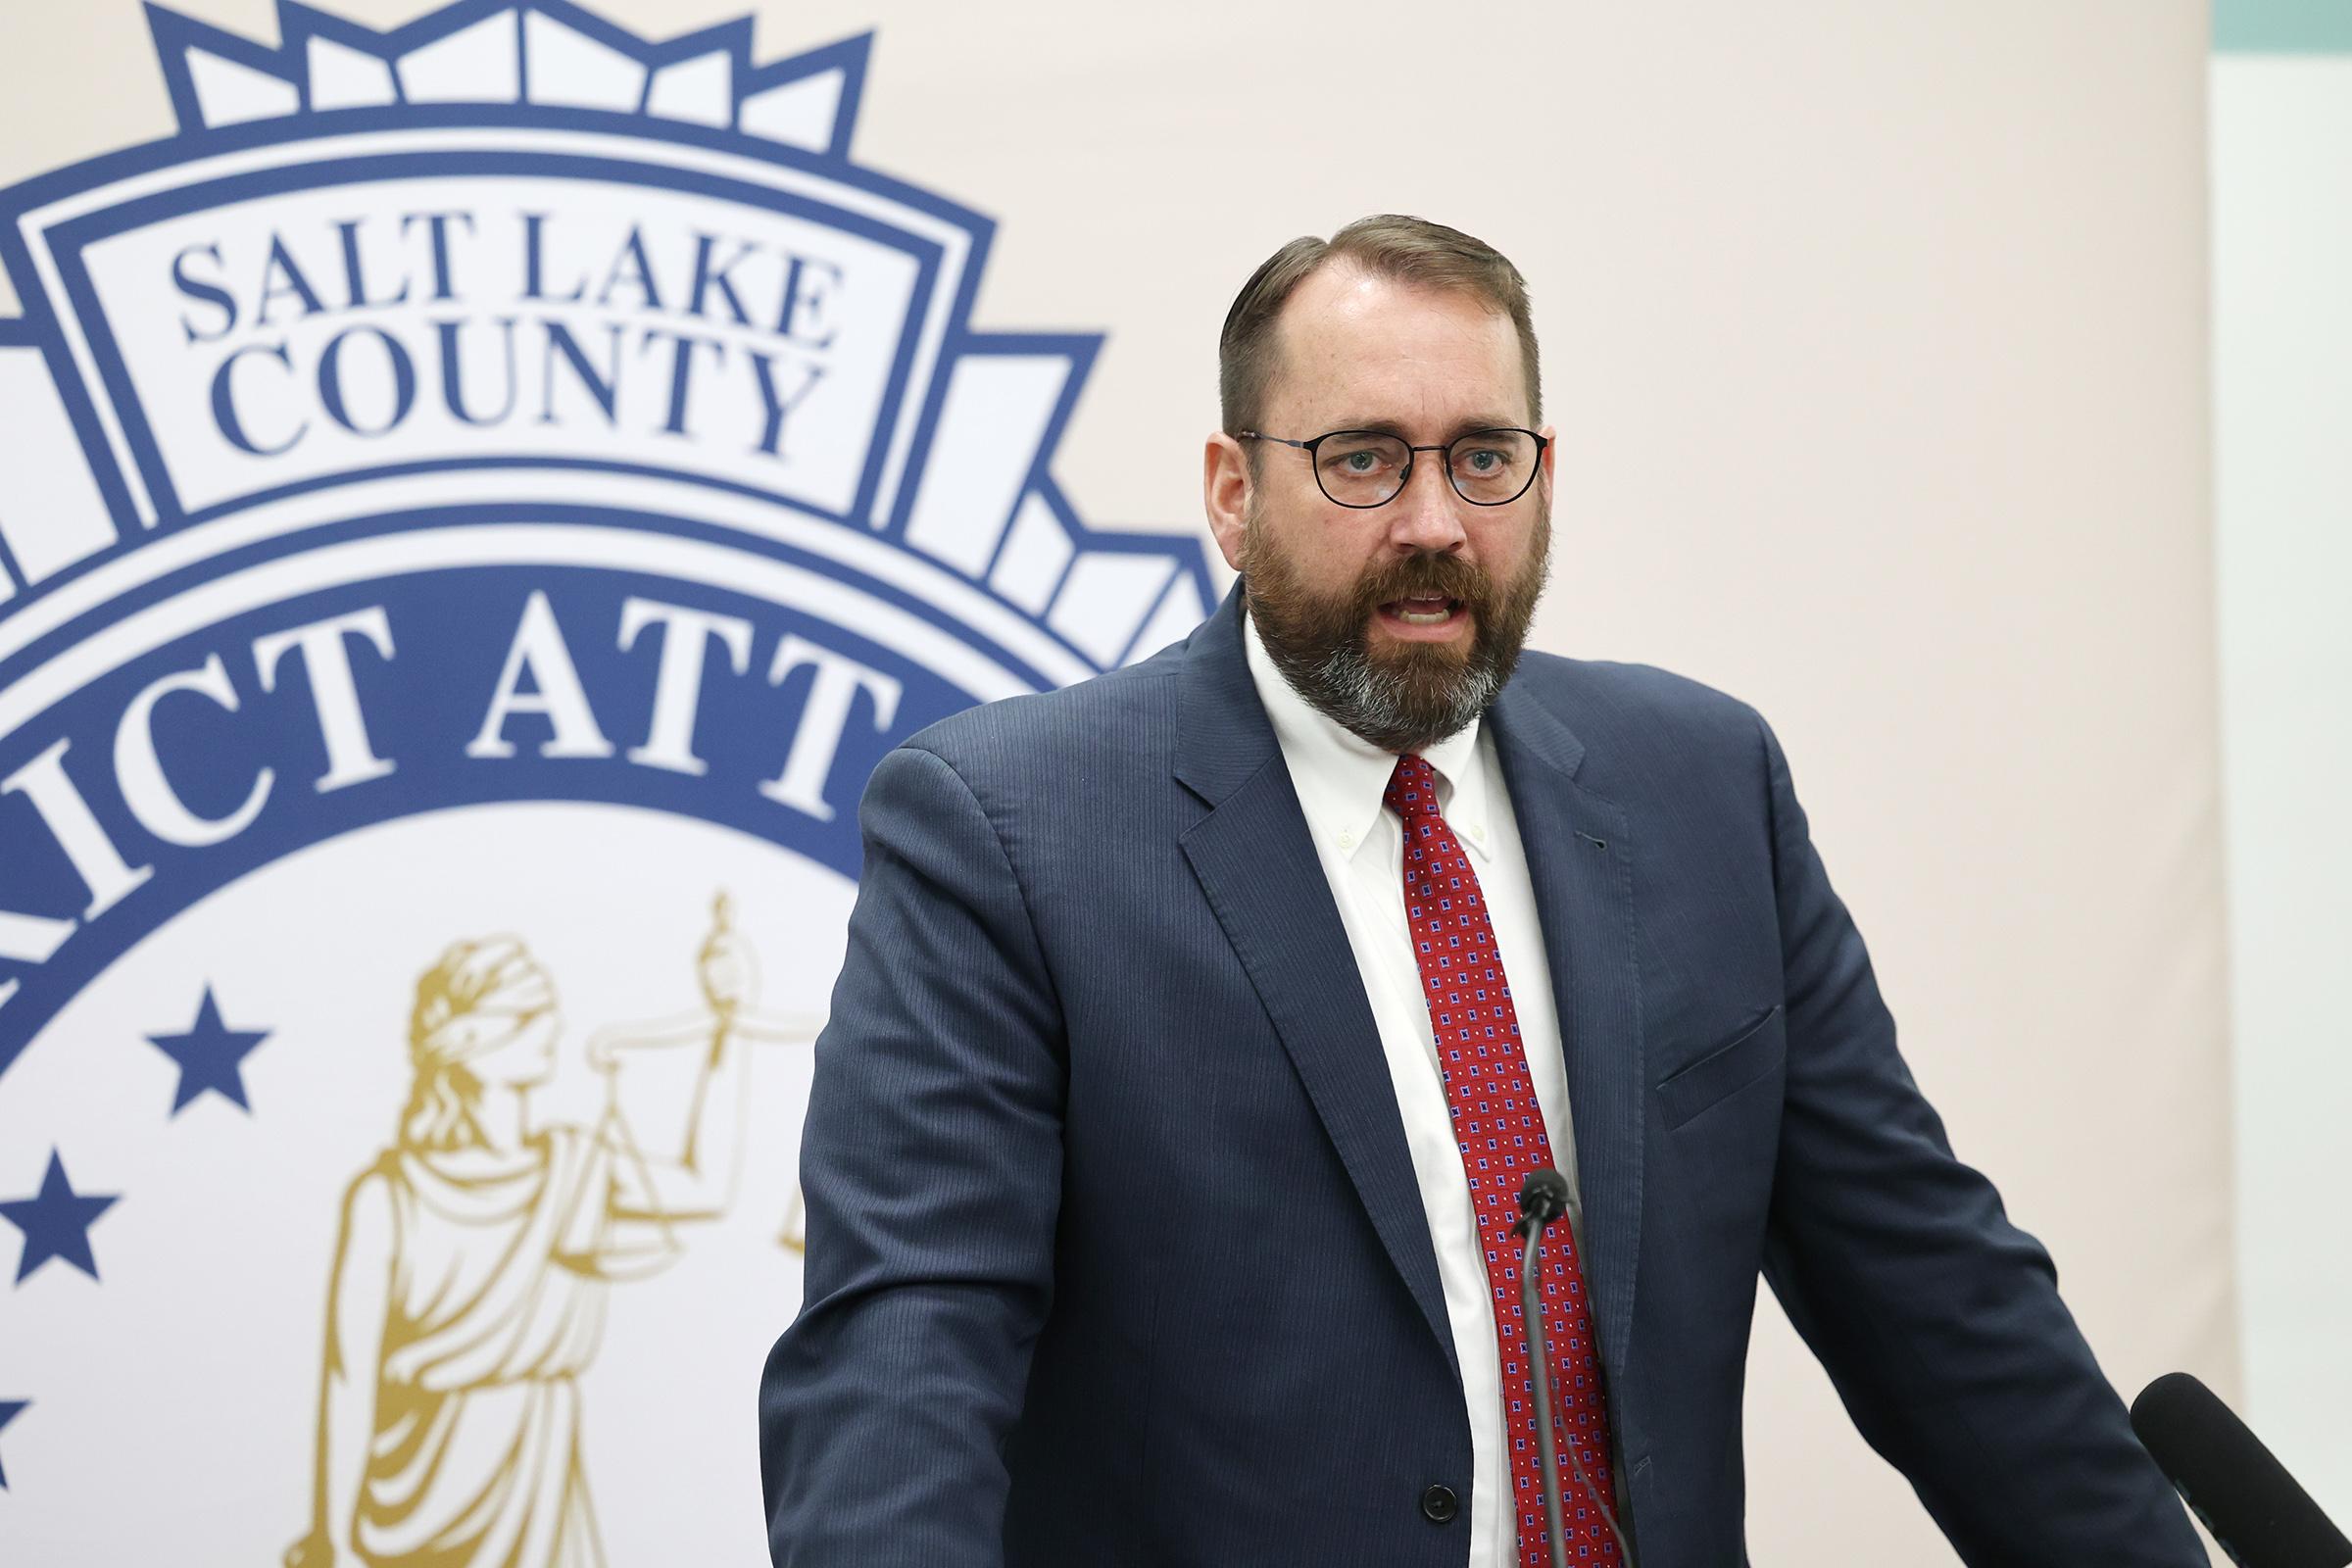 Utah County Attorney David Leavitt